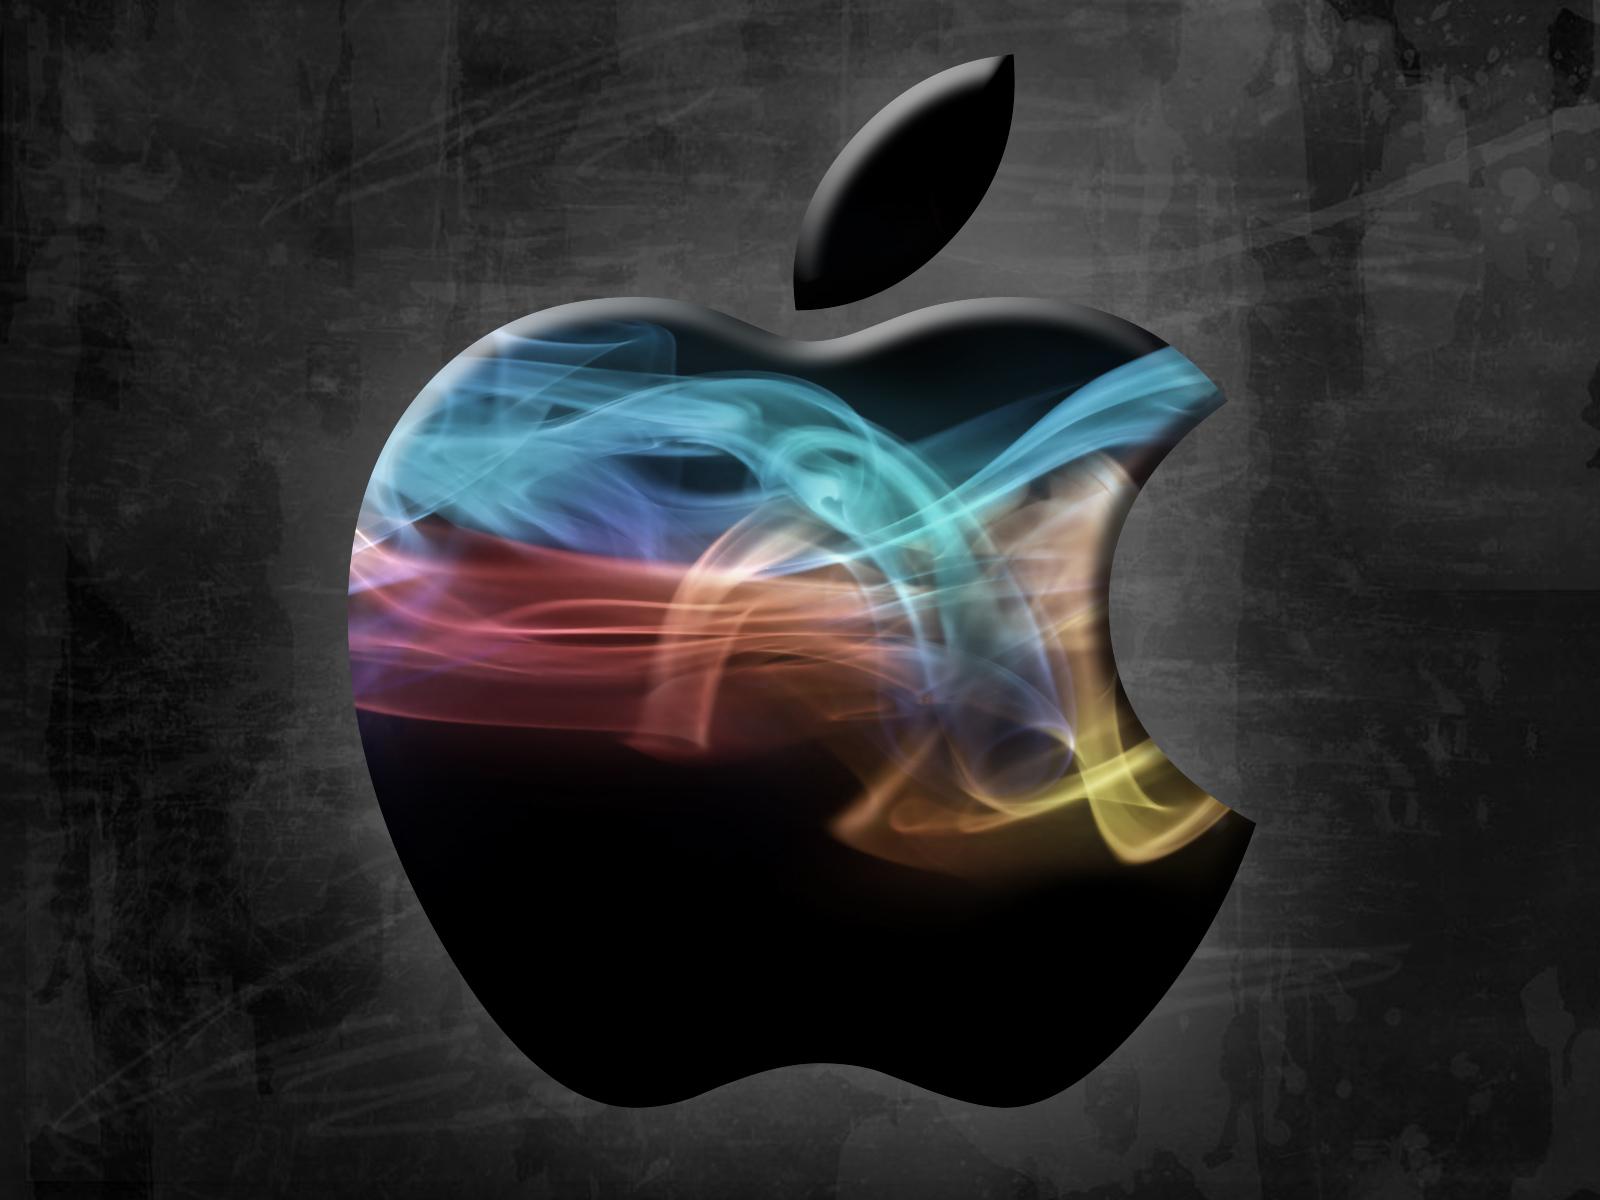 http://3.bp.blogspot.com/-sKa8hU7ERqI/TfmXdfCYSGI/AAAAAAAAB50/2-ysRJDvJ8k/s1600/apple%2520ipad%2520wallpapers4.jpg